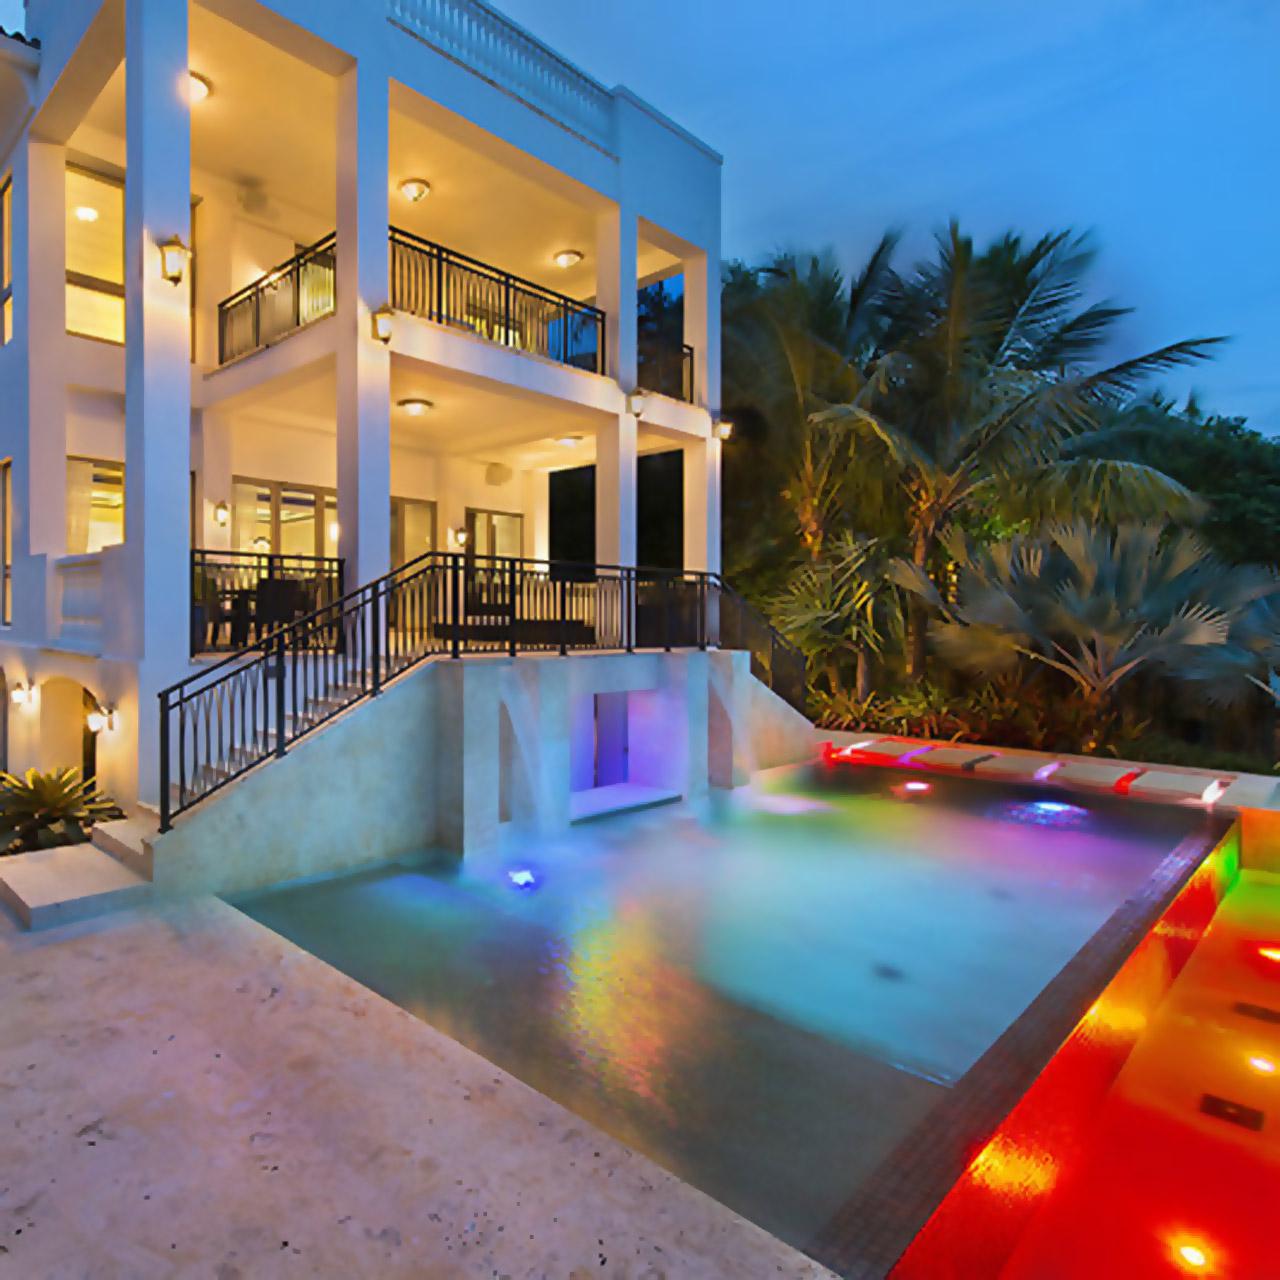 LeBron James' Miami mansion still for sale at $15 million.